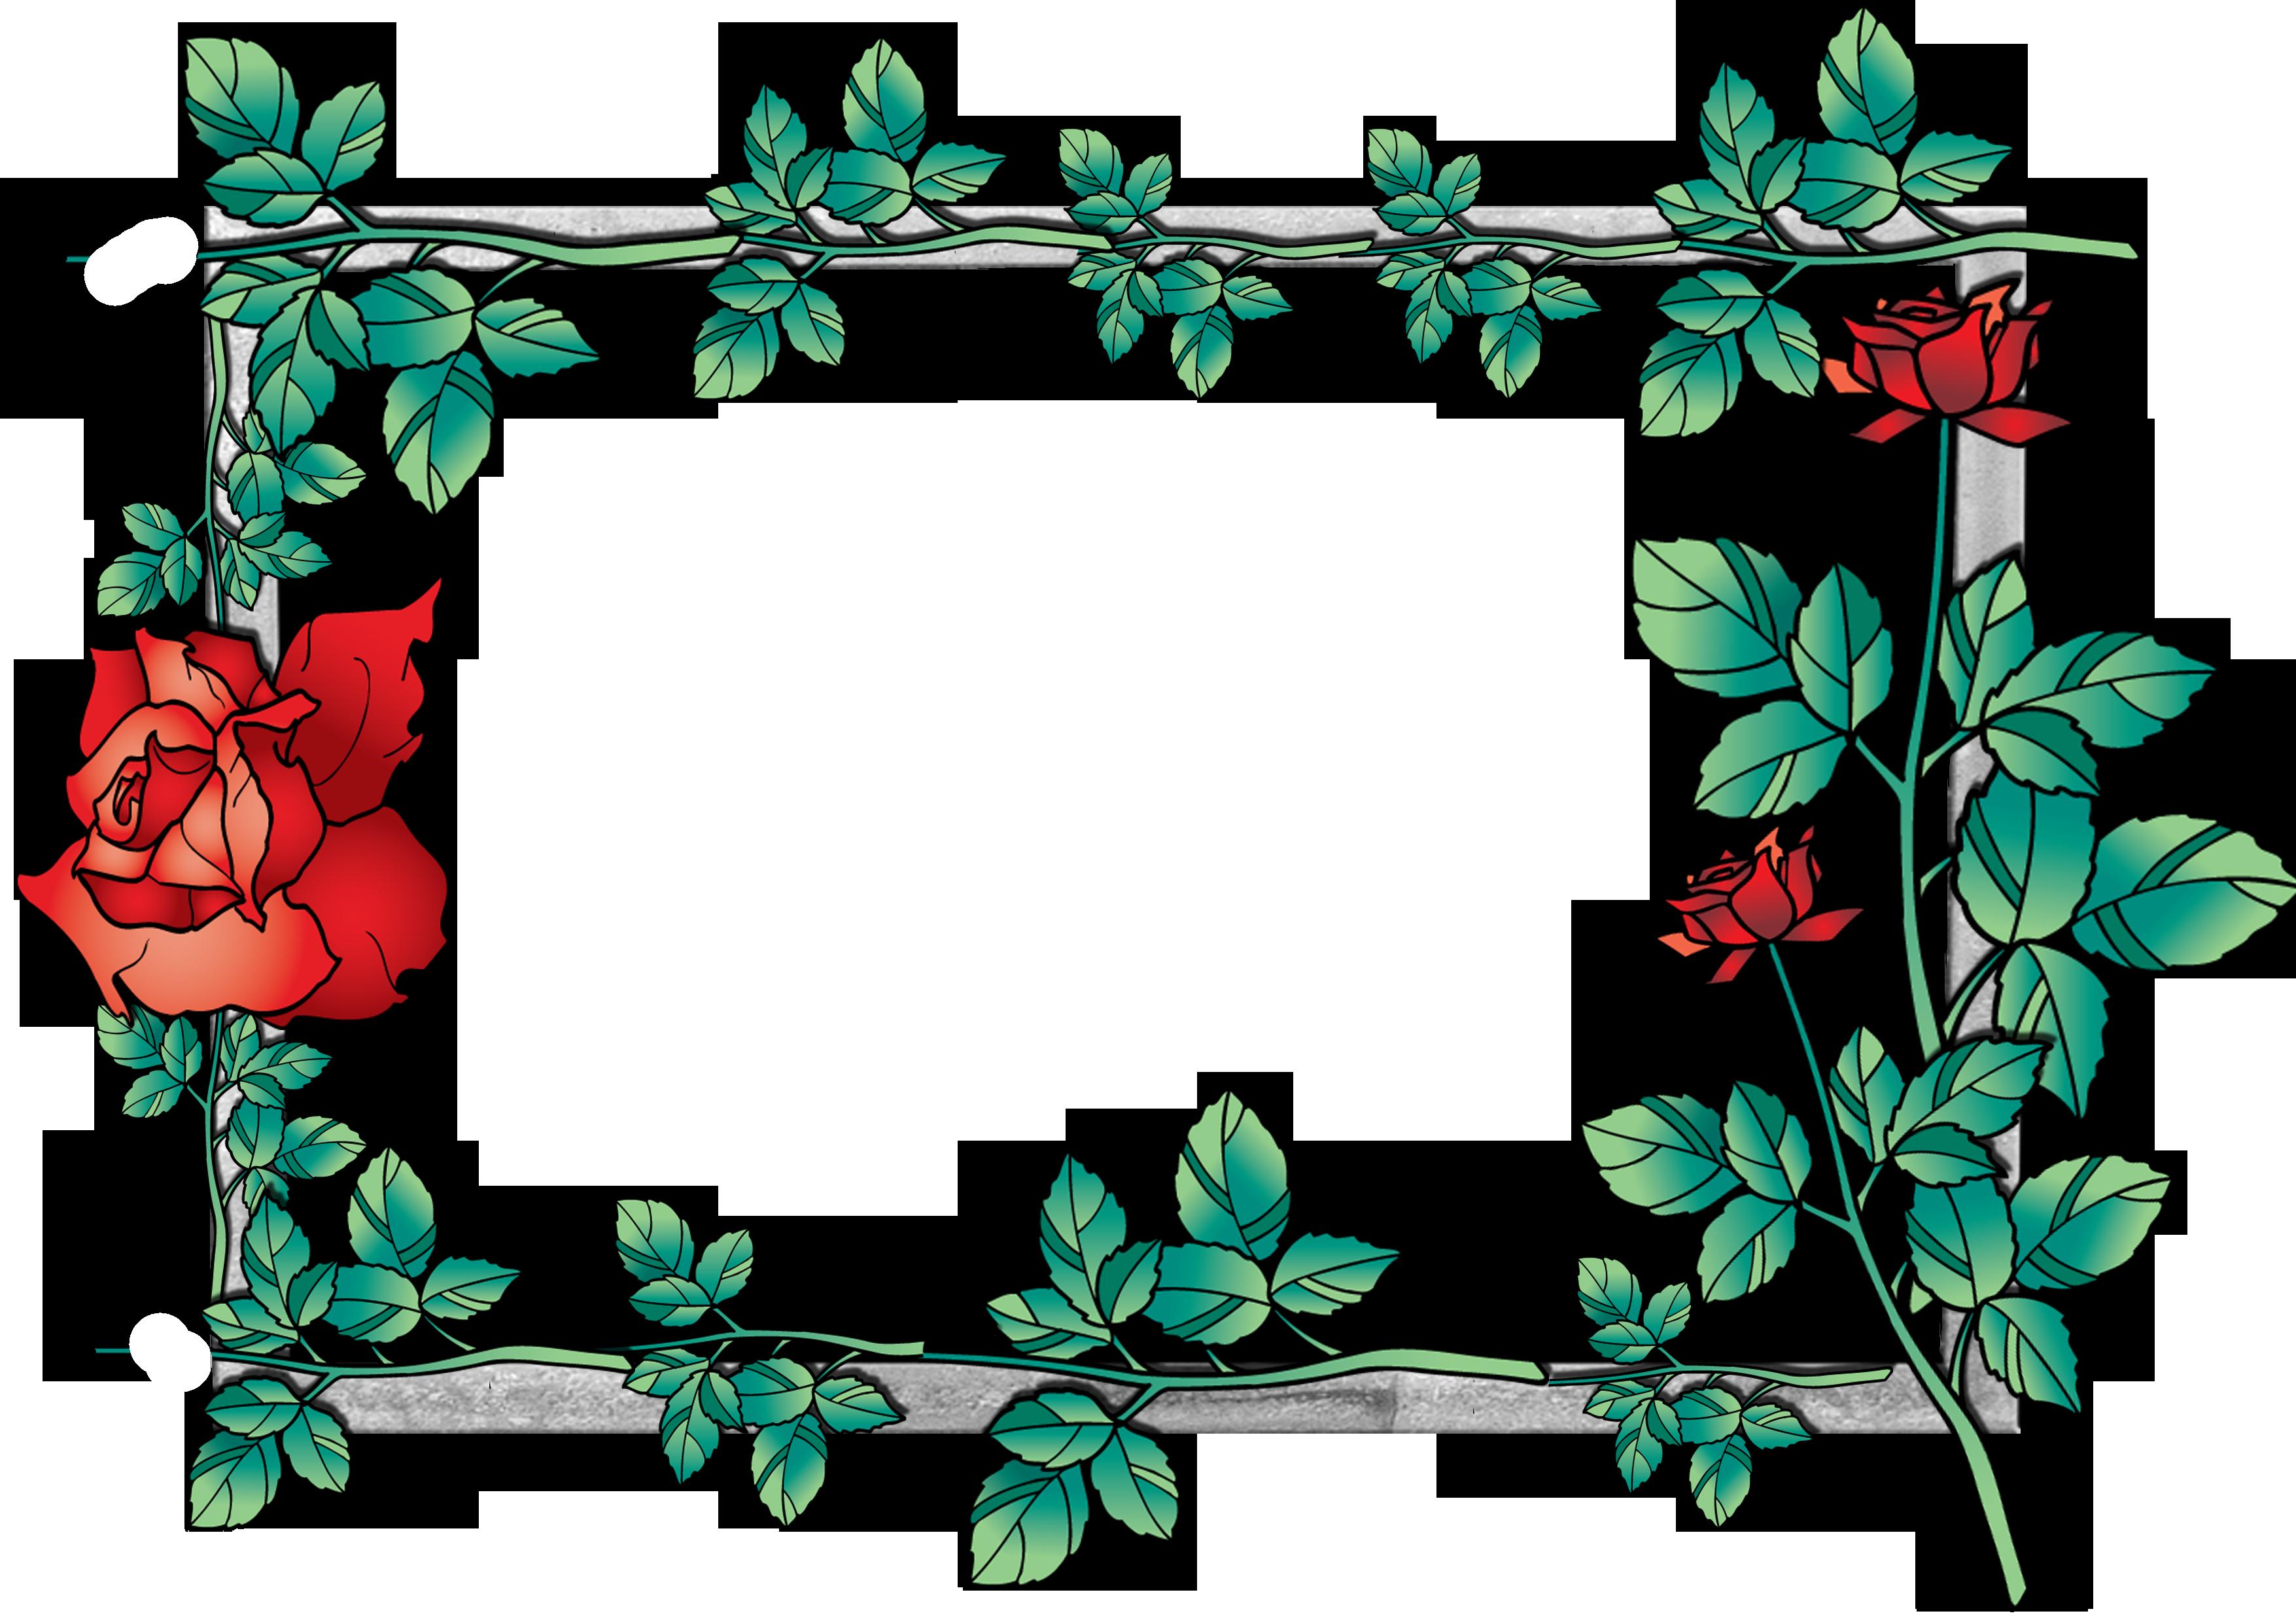 Flower frames clipart jpg transparent stock Flowers frame (1)   Gallery Yopriceville - High-Quality Images and ... jpg transparent stock